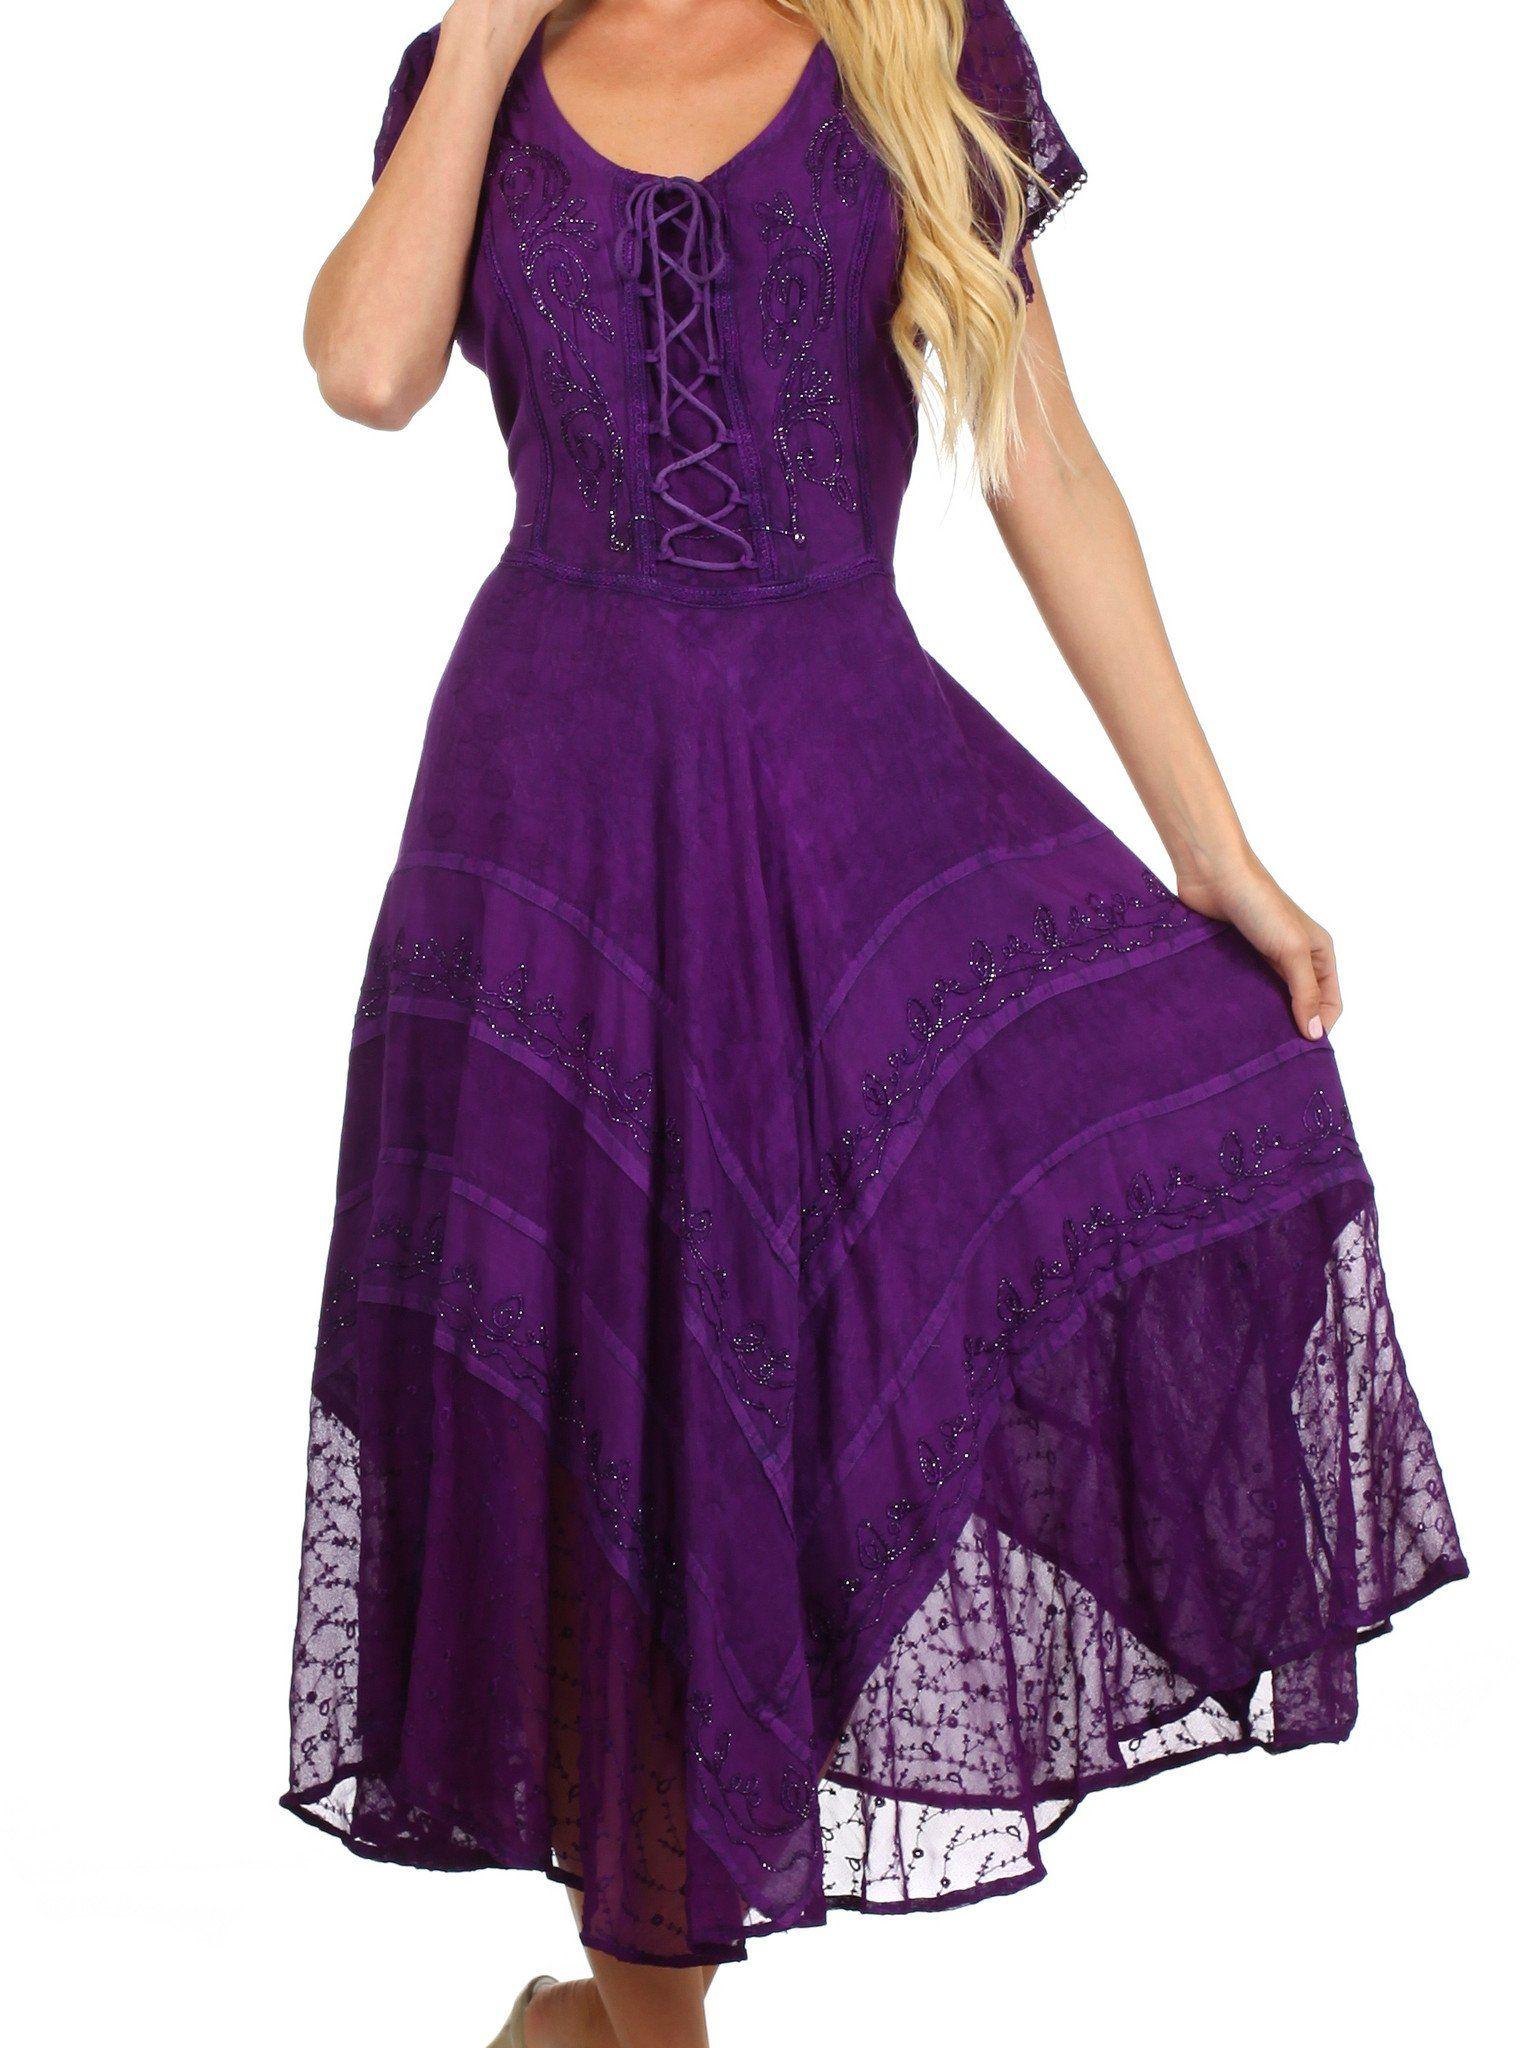 Sakkas Marigold Embroidered Fairy Dress | Sakkas Teacher | Pinterest